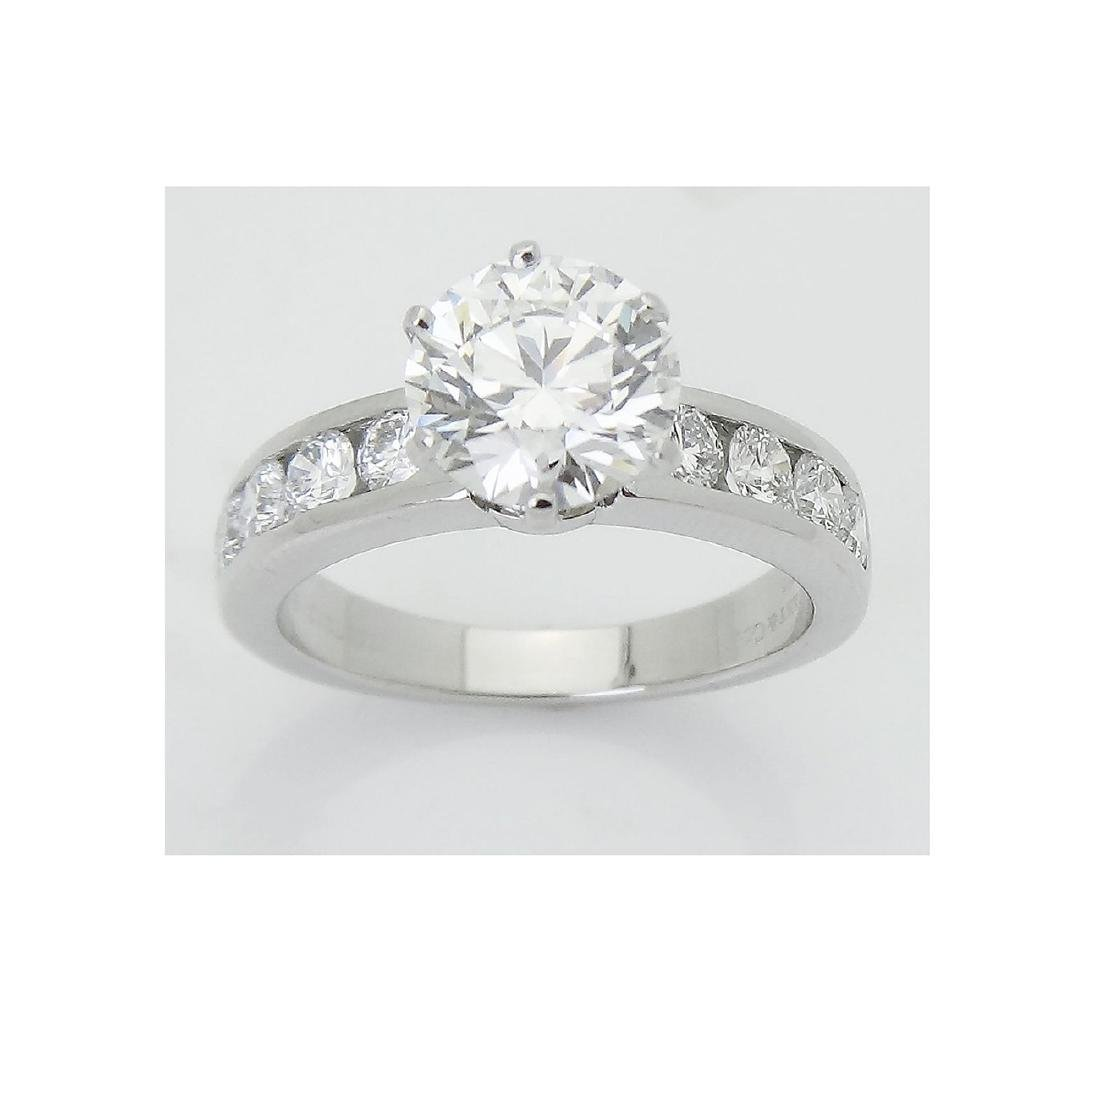 Tiffany & Co 950 2.19 VVS1 G Engagement Ring w/ GIA